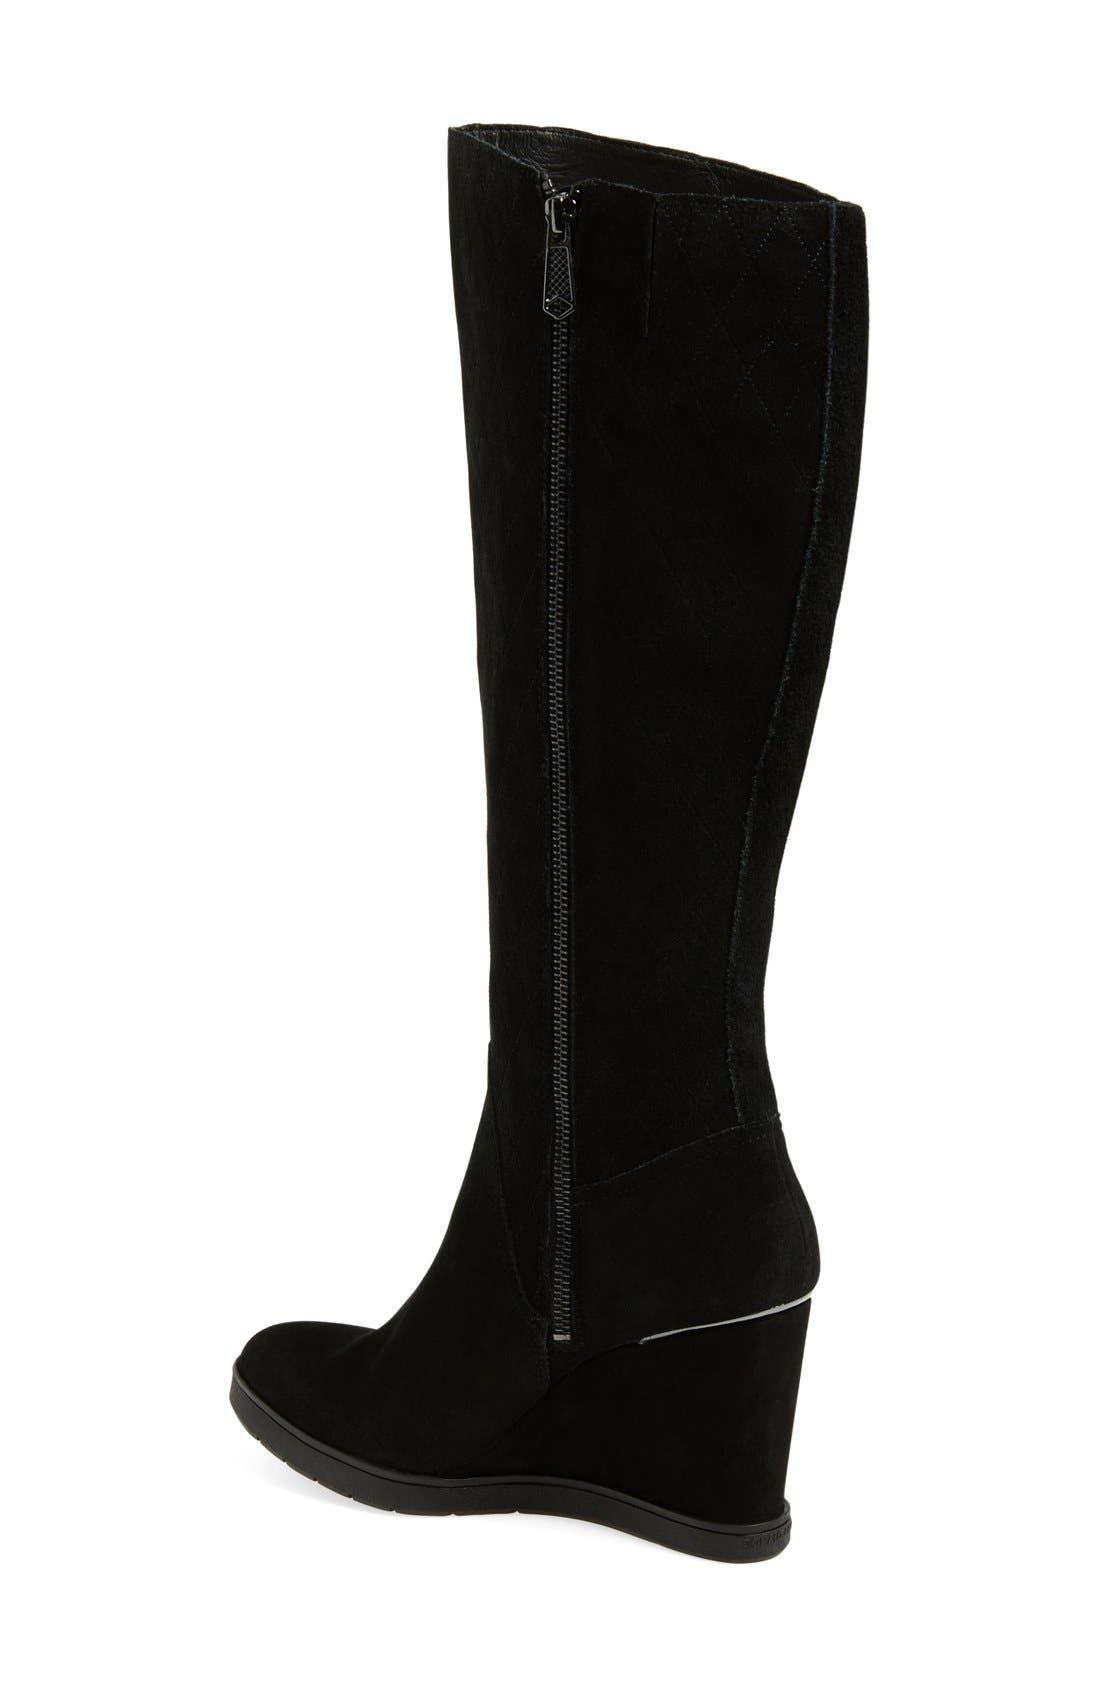 Alternate Image 2  - Donald J Pliner 'Cadi' Wedge Boot (Women)